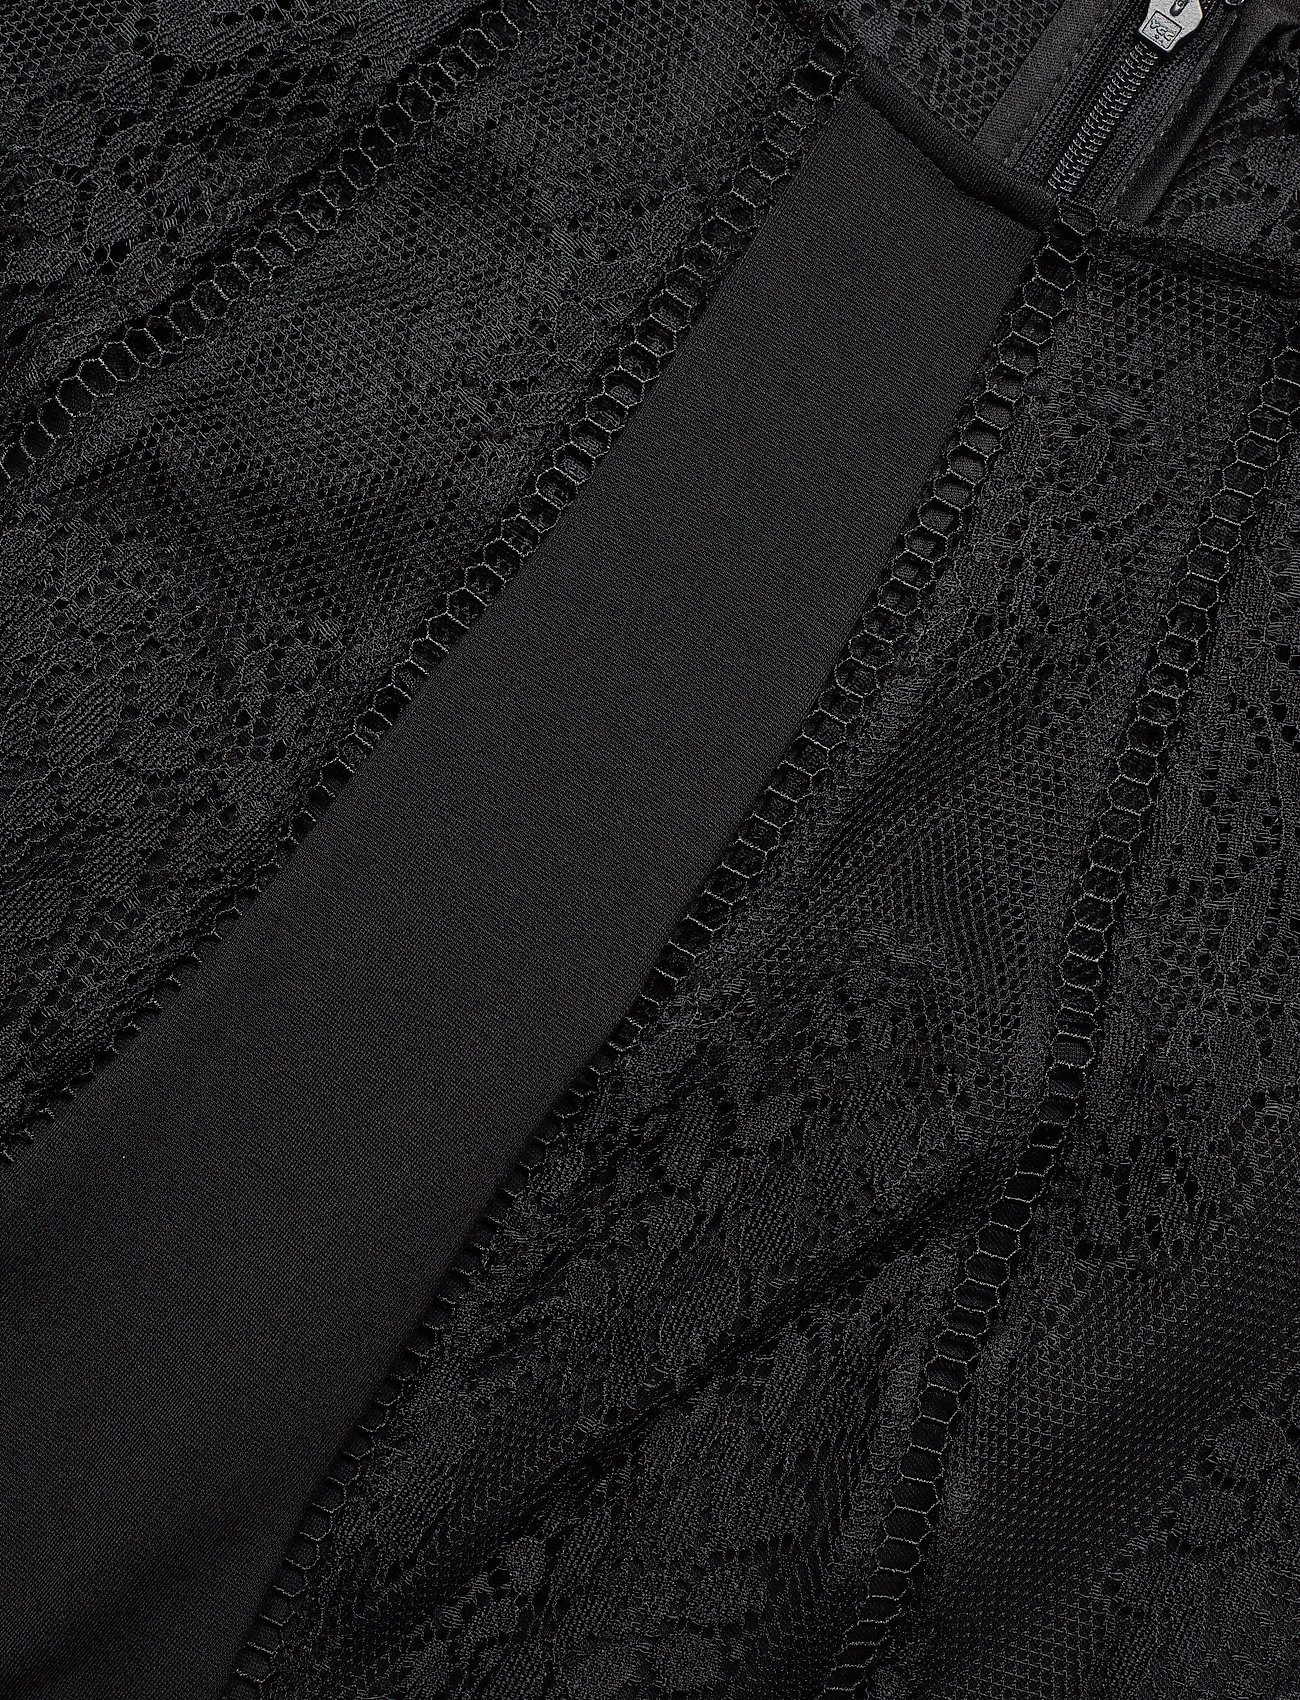 Loredana A996Guess Loredana Dressjet Black Jeans Dressjet yYb7g6f